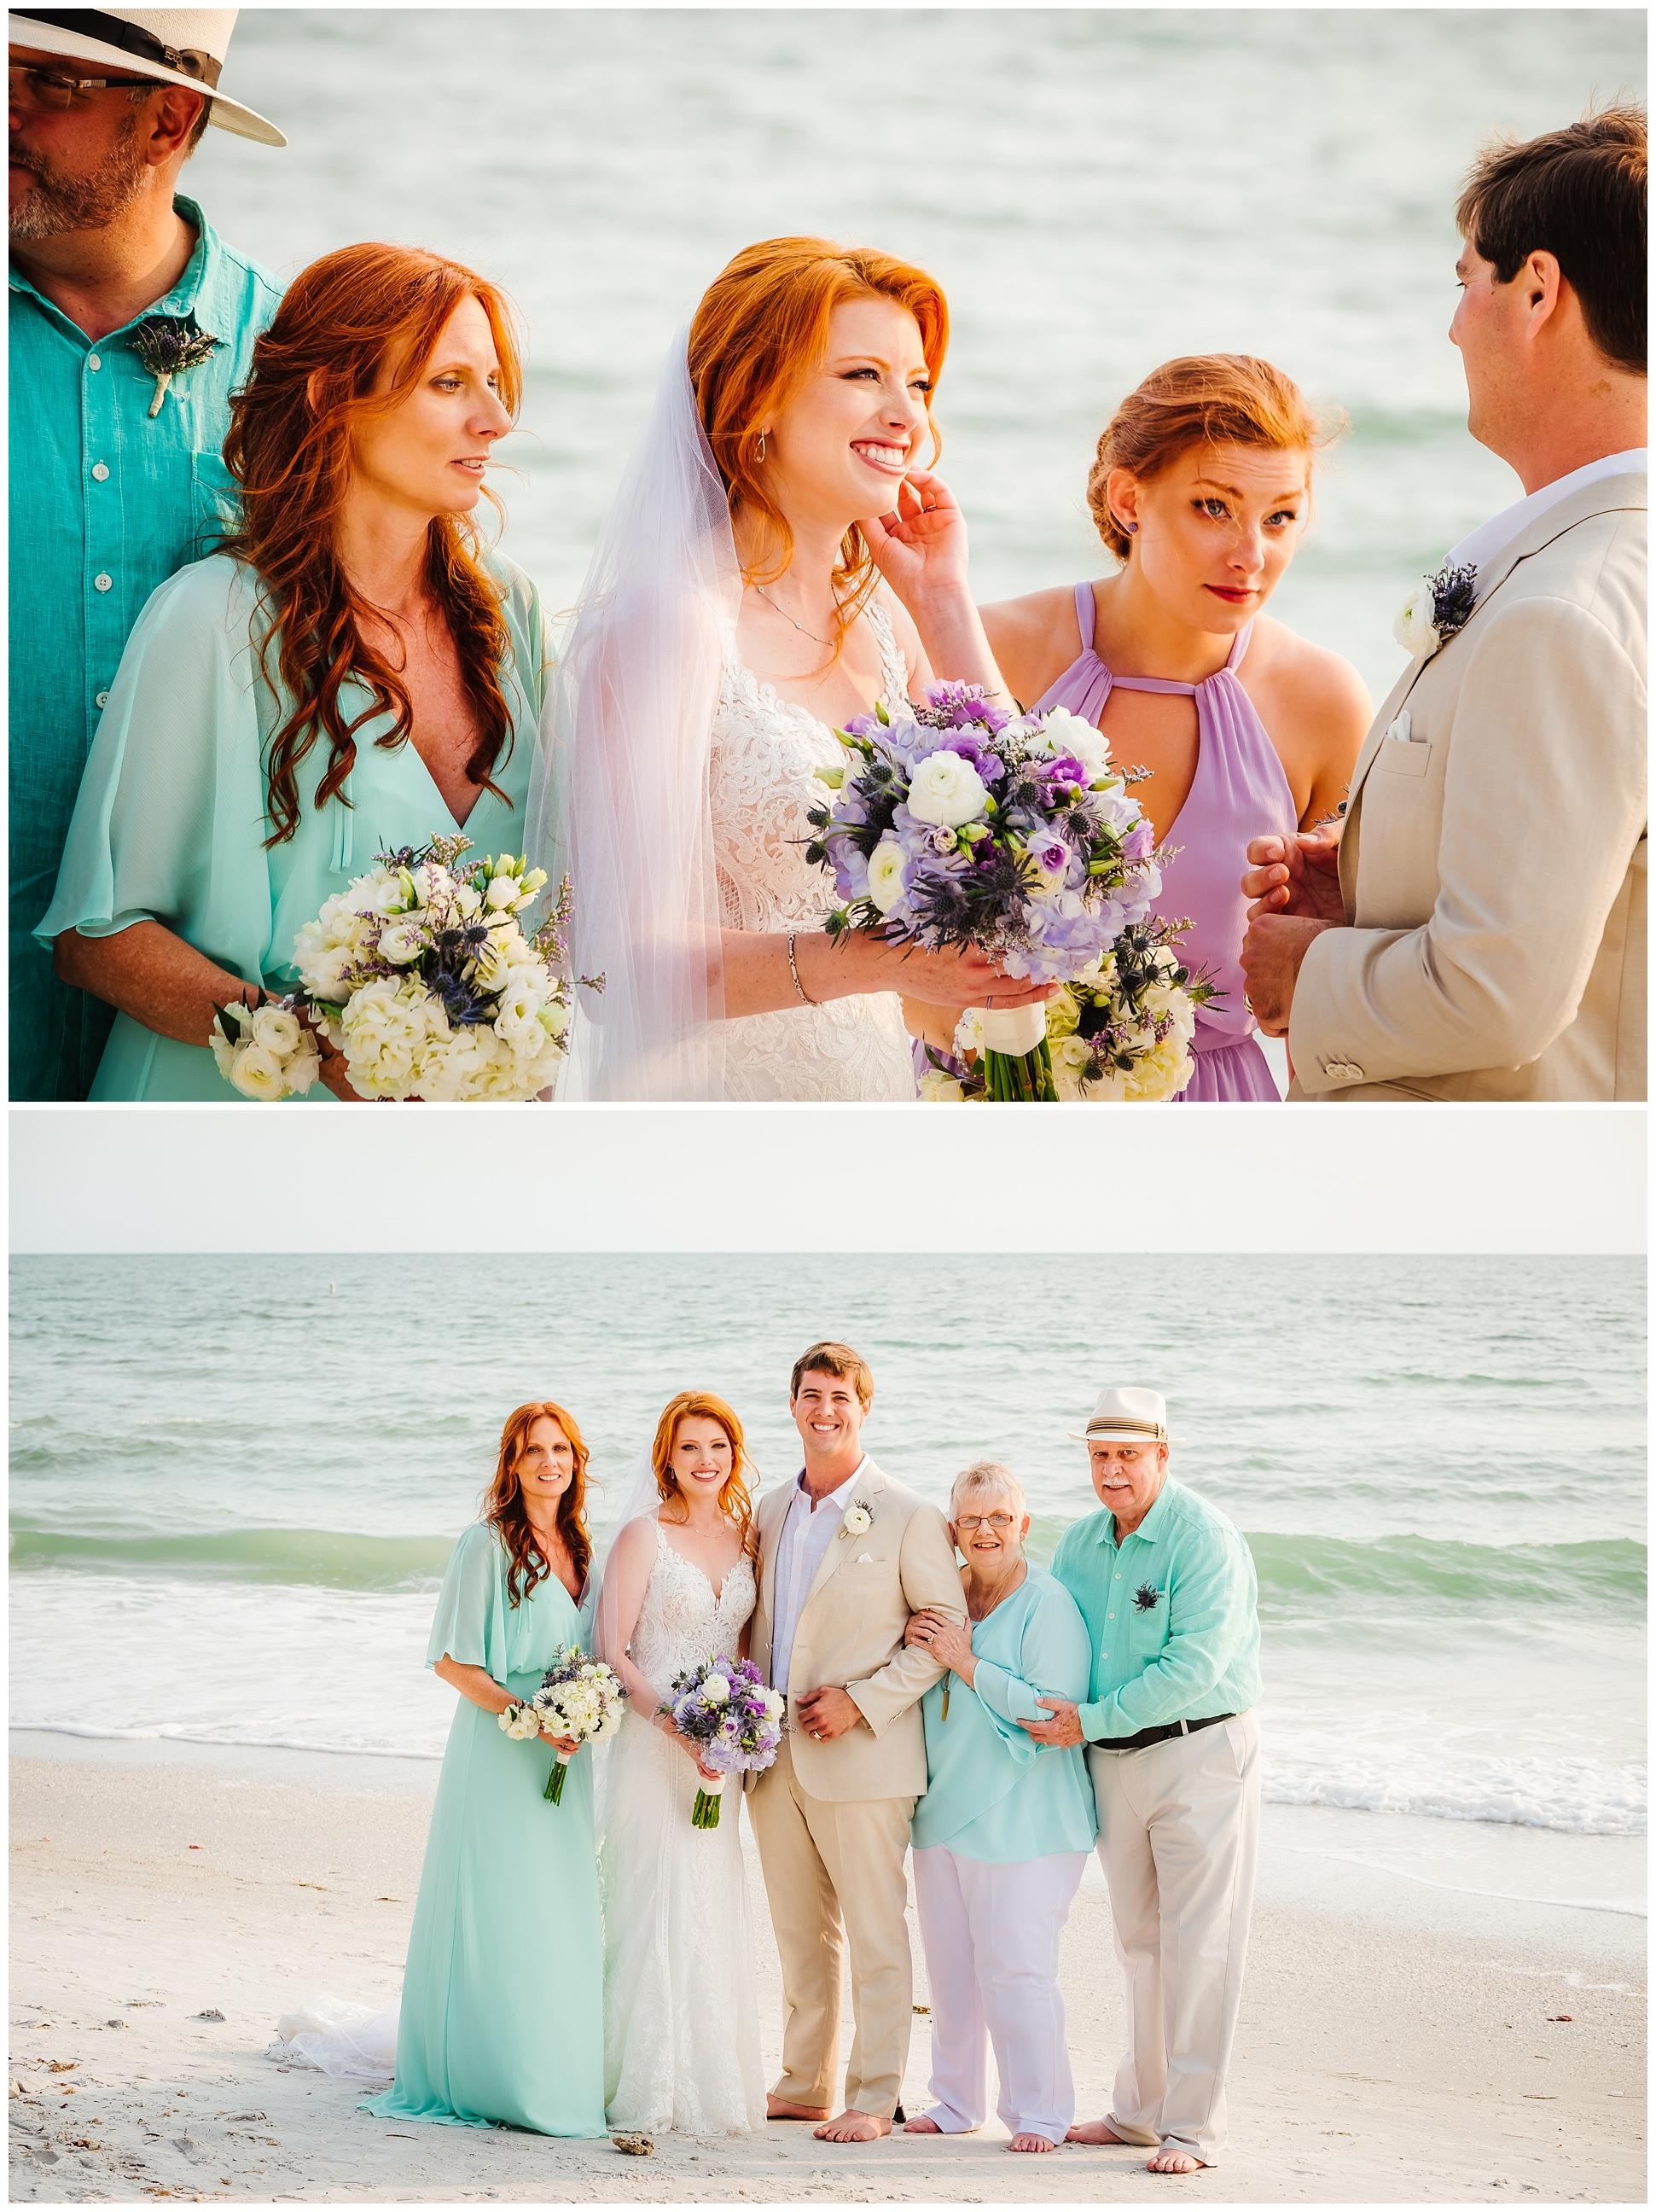 tampa-st-pete-wedding-photographer-indian-rocks-beach-mermaid-train-redhead_0143.jpg